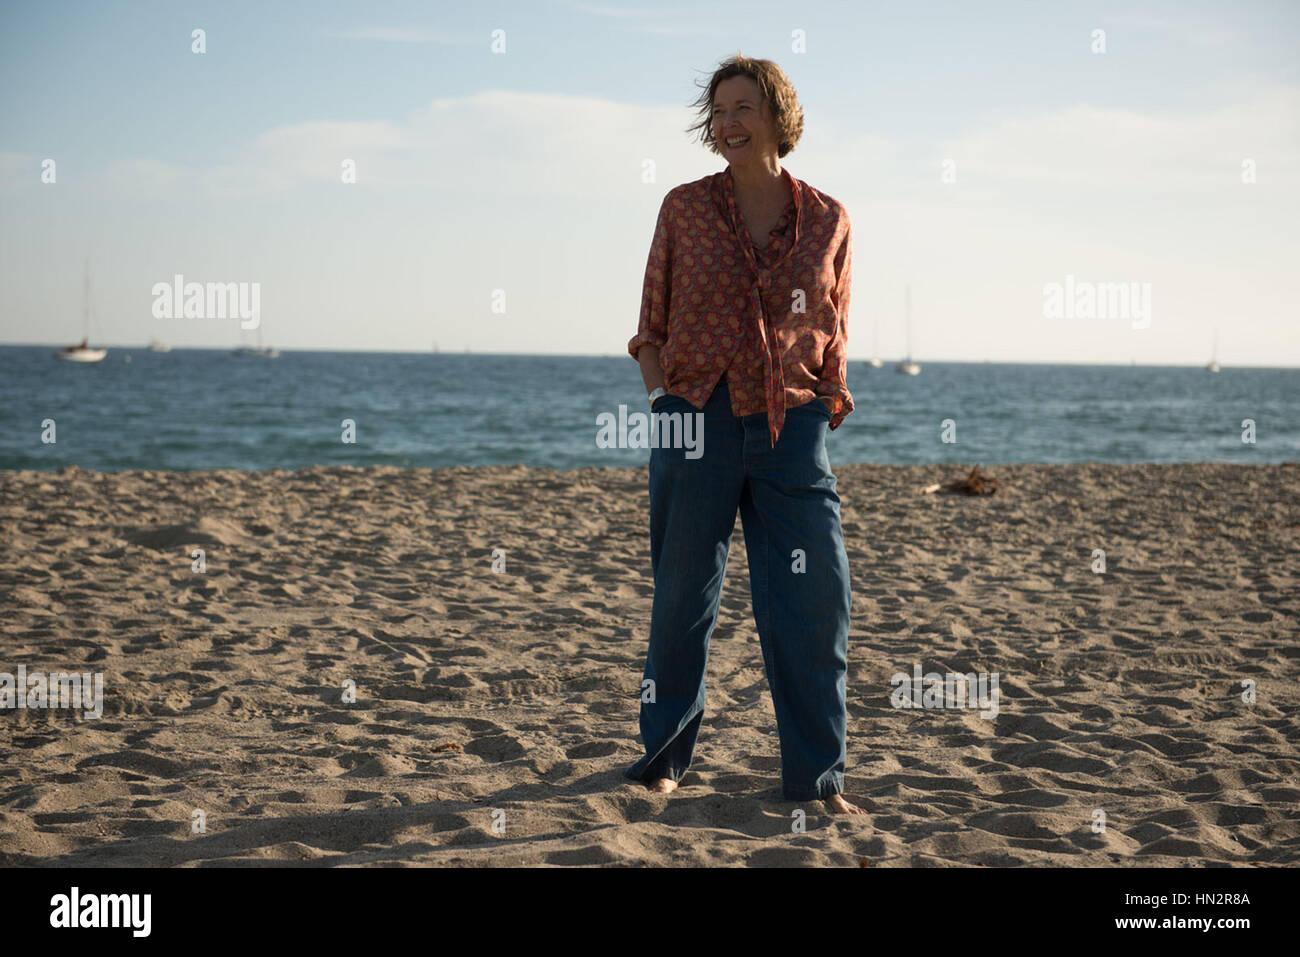 Xx secolo le donne (2016) Annette Bening Mike Mills (dir) annapurna pictures/raccolta moviestore ltd Immagini Stock